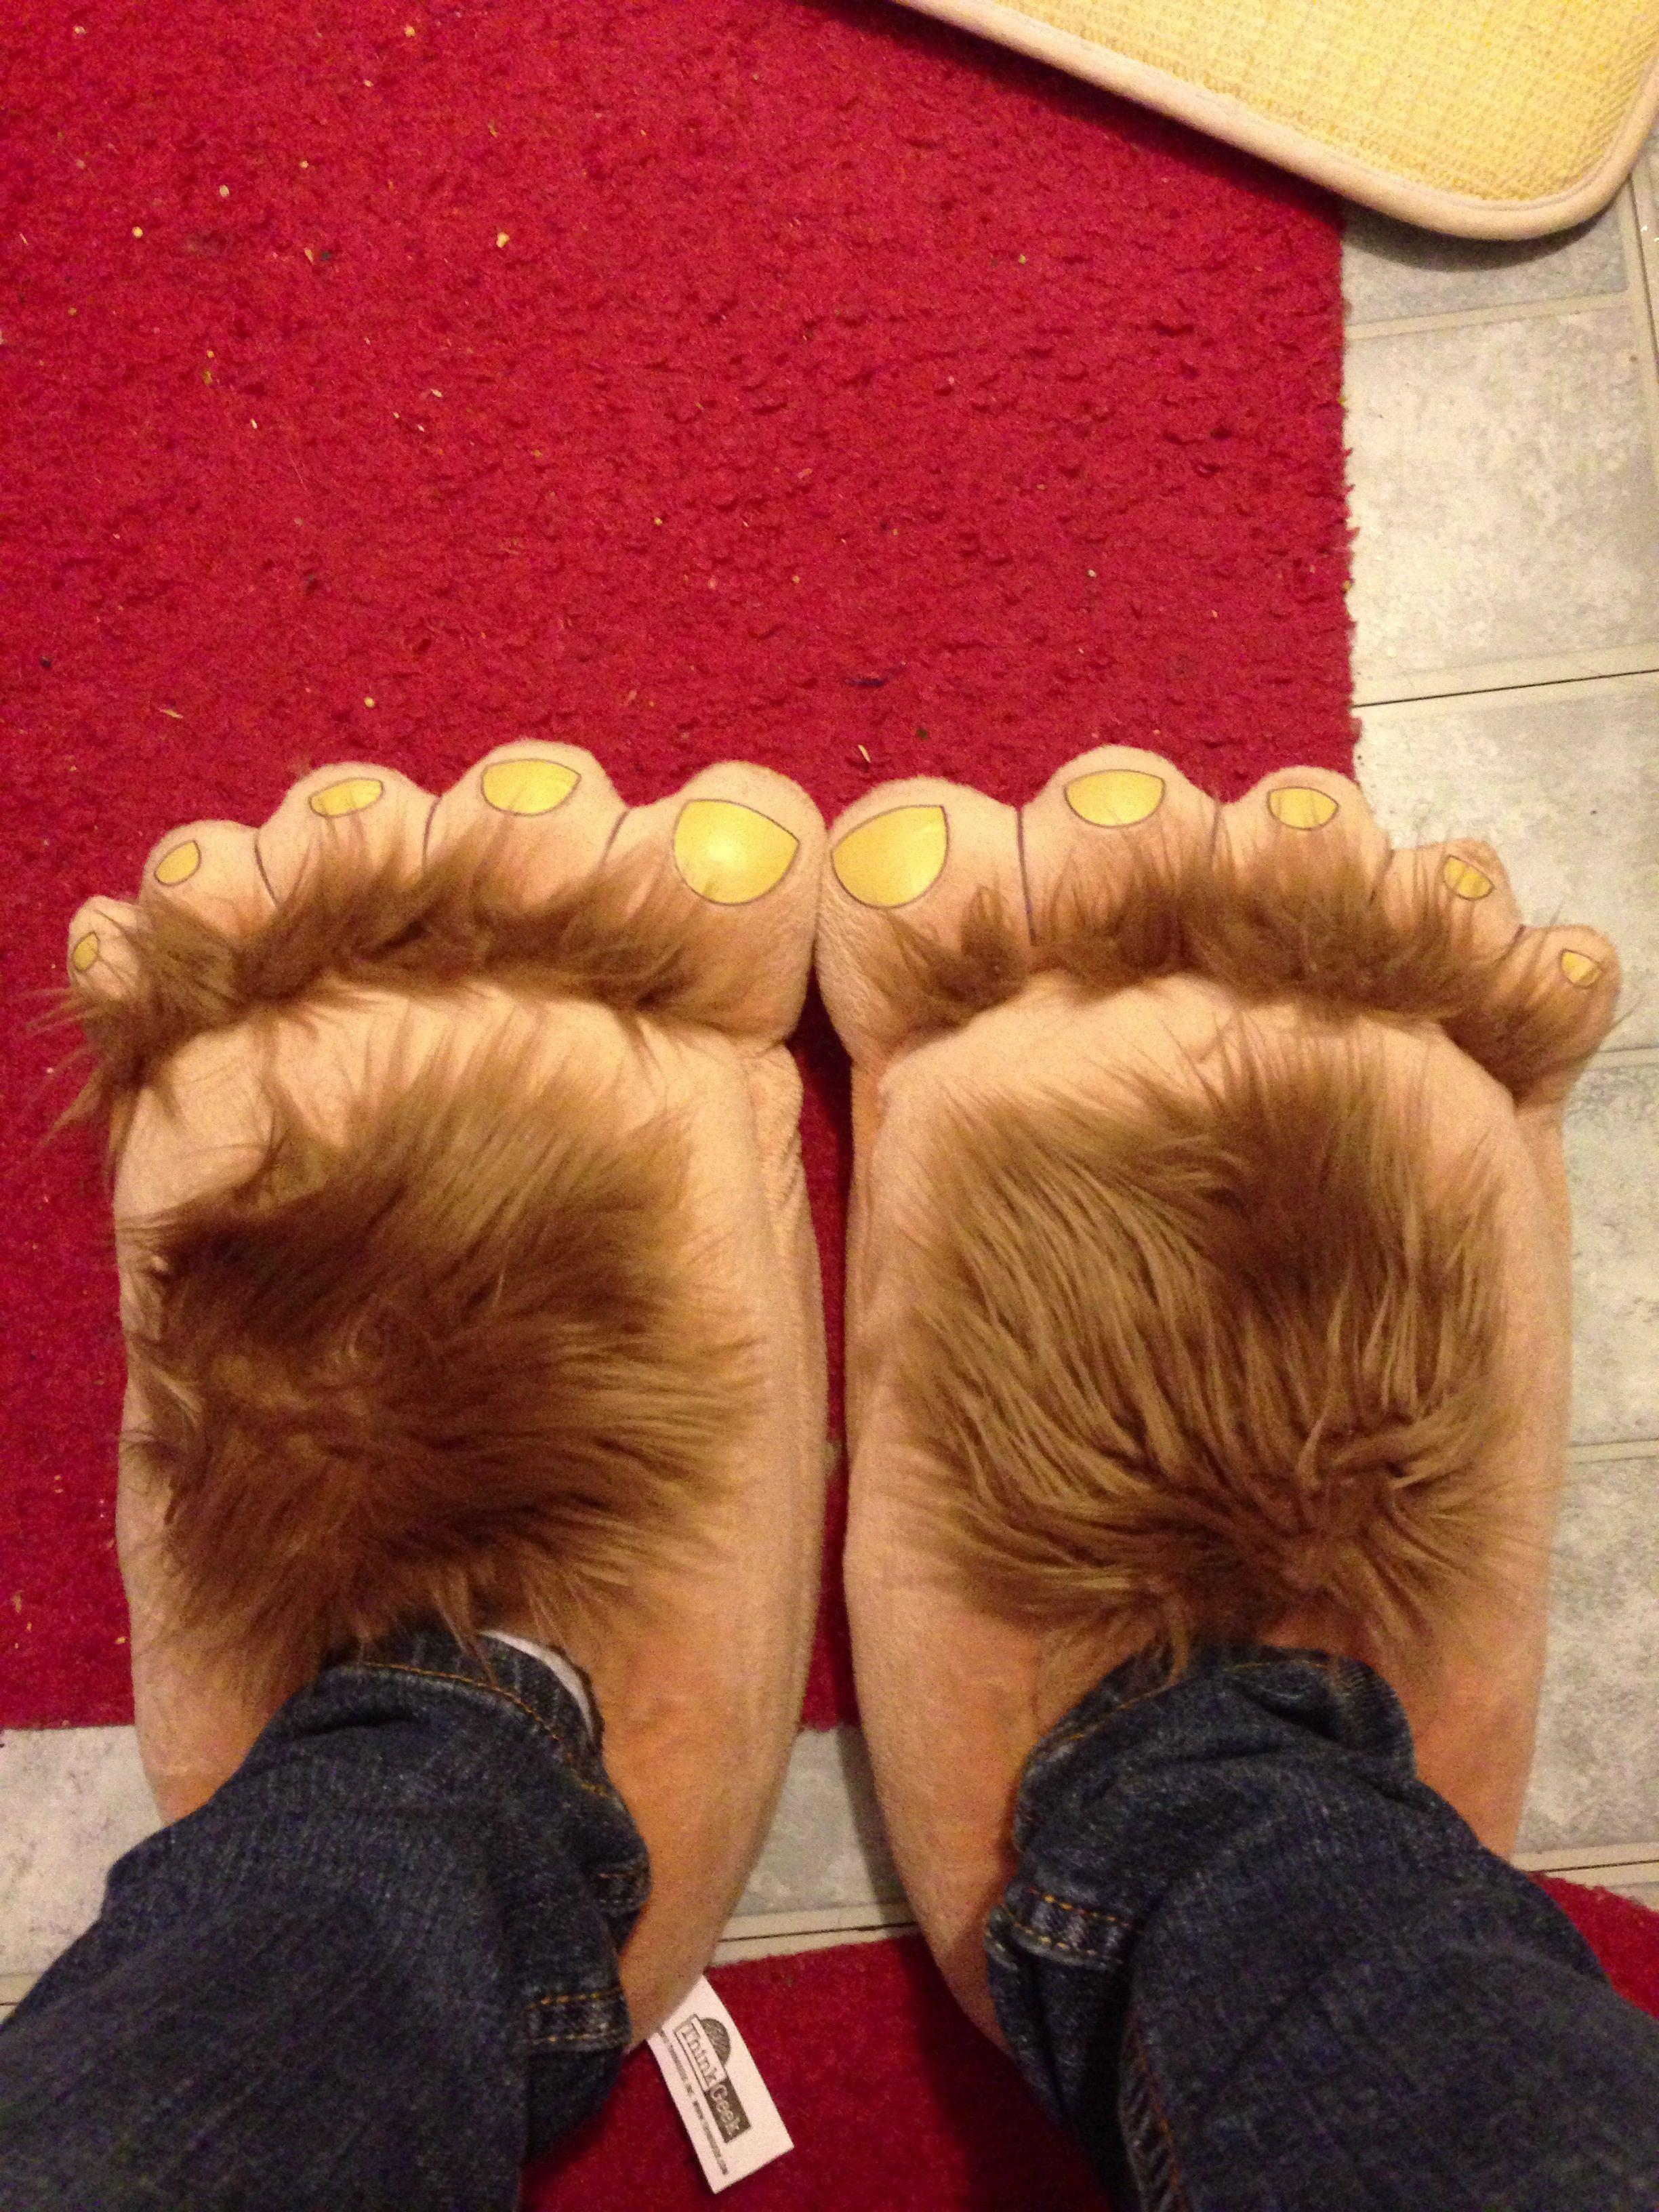 Hairy Plush Hobbit Feet Adventure Costume Furry Slippers ... |Hobbit Feet Slippers